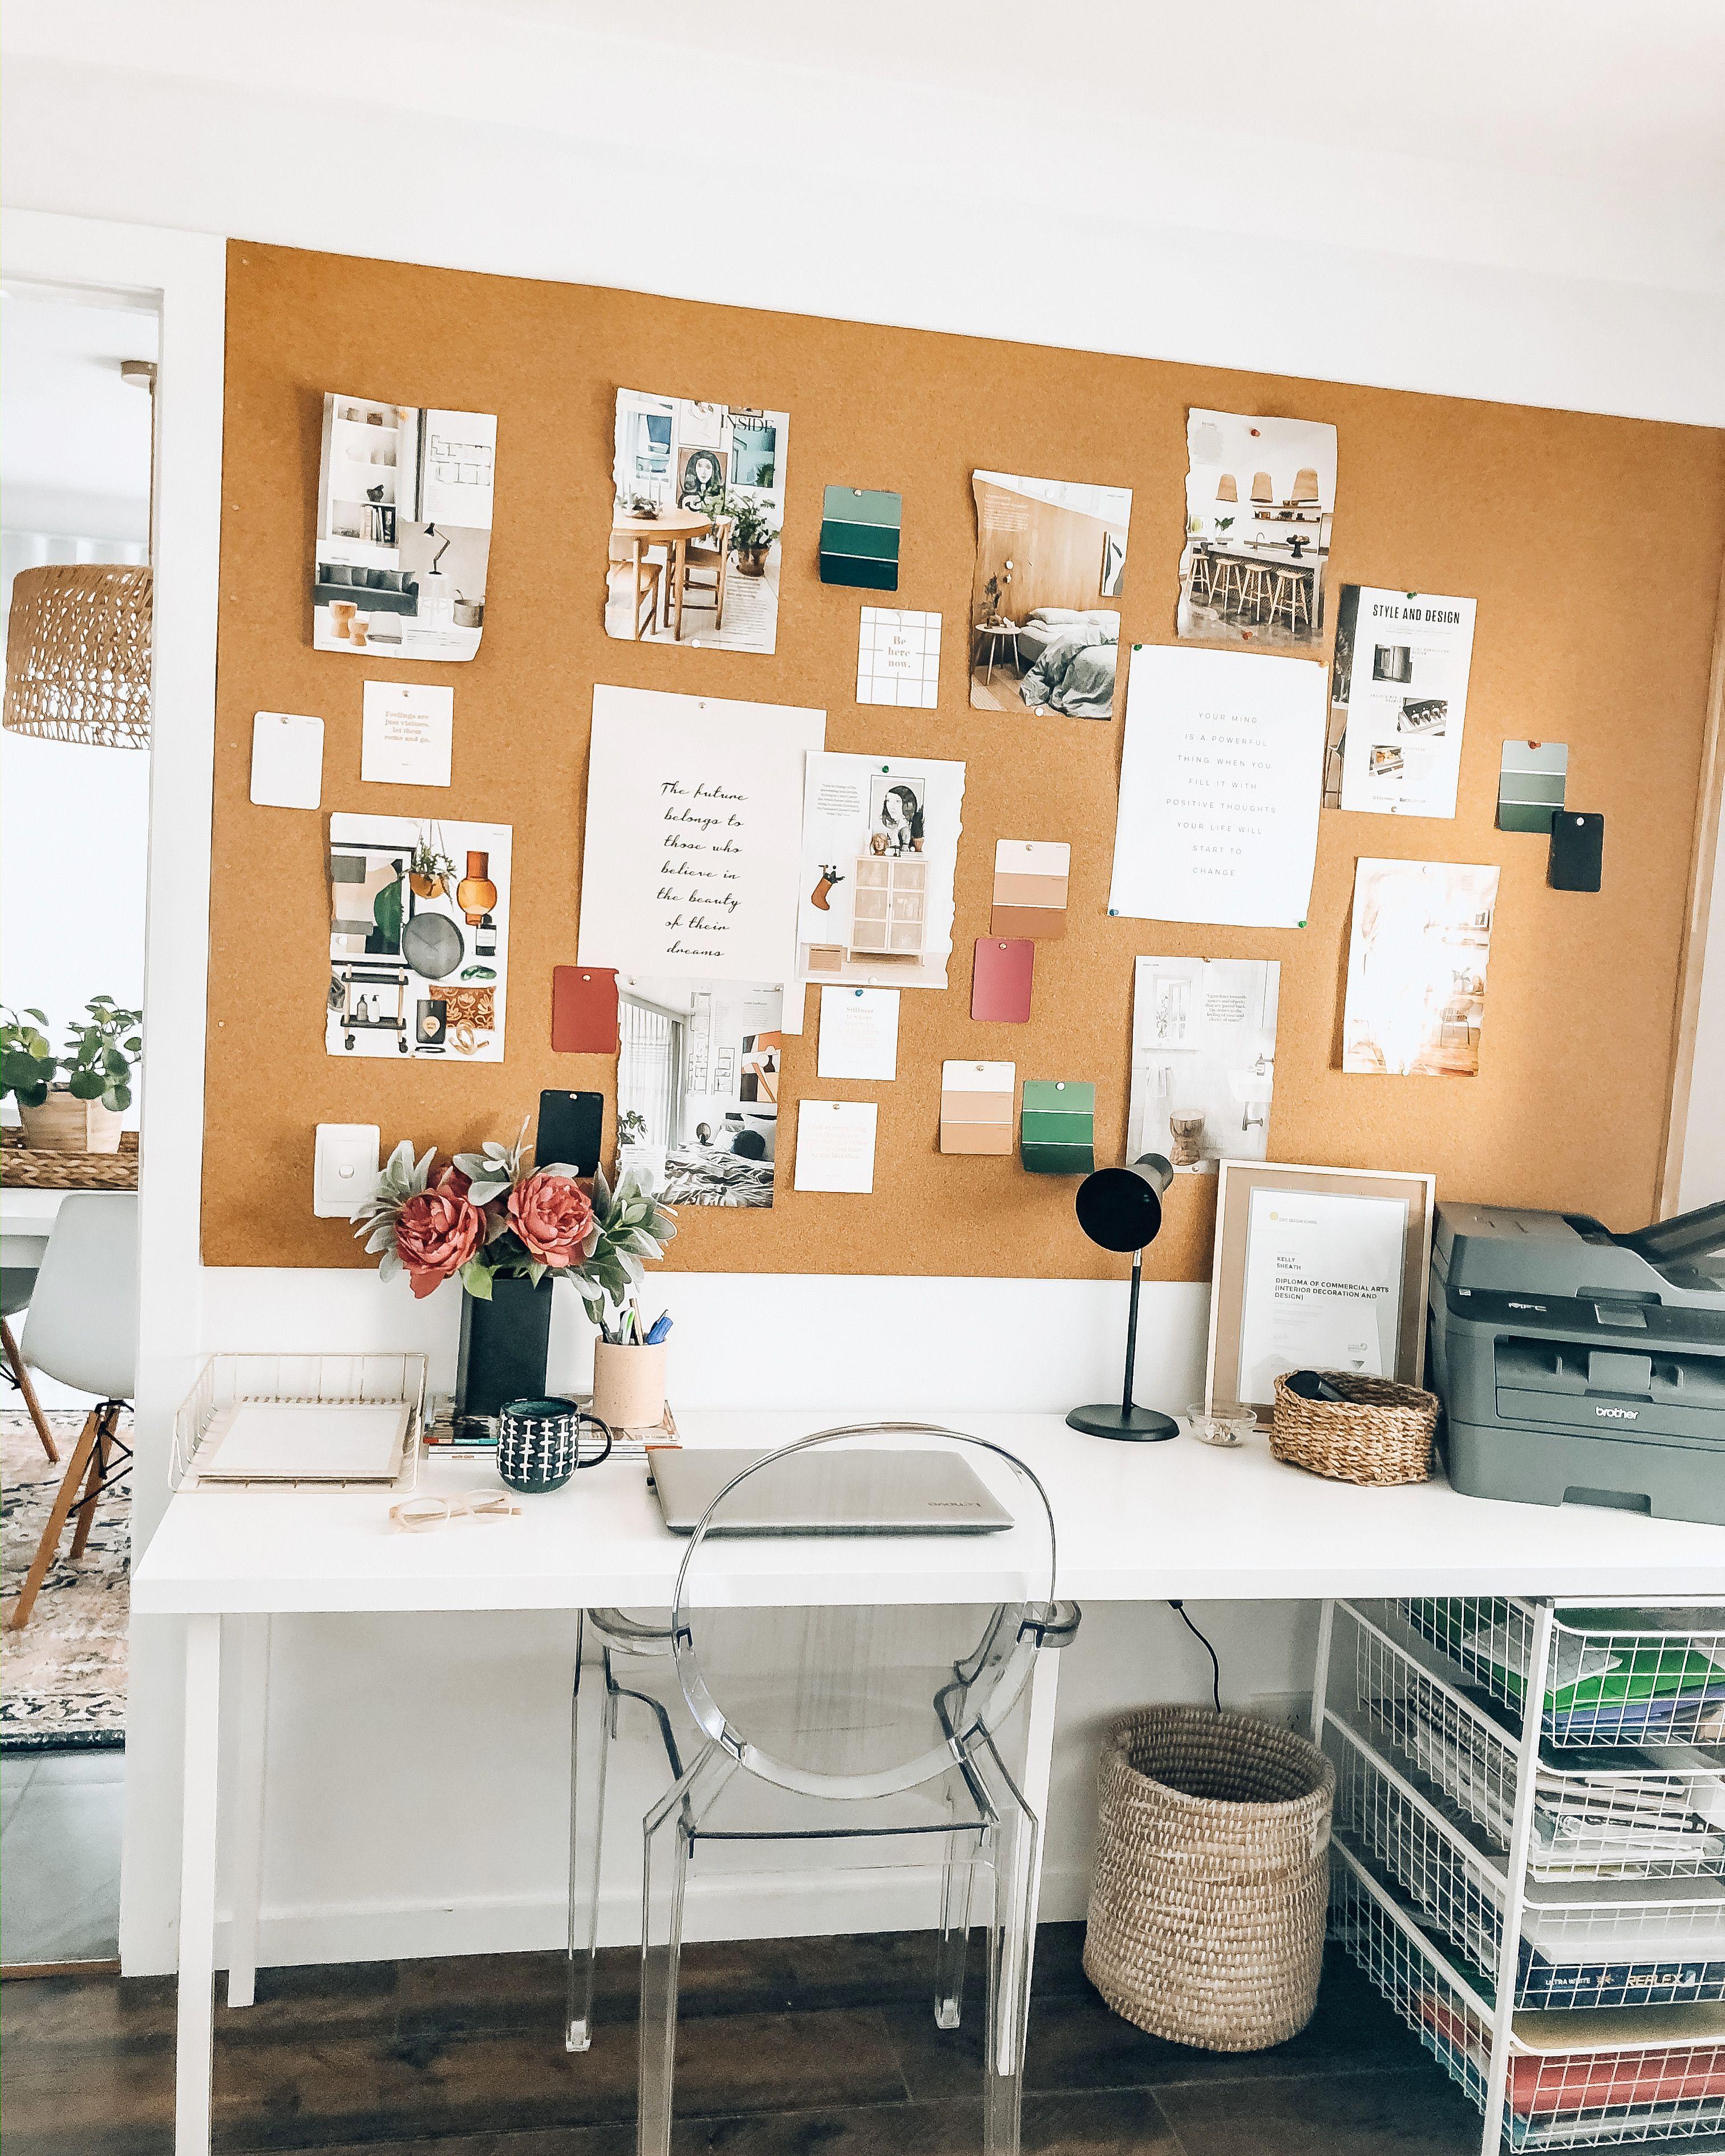 Diy Homeoffice Desk Ideas: Home Decor, Home Office Design, Home